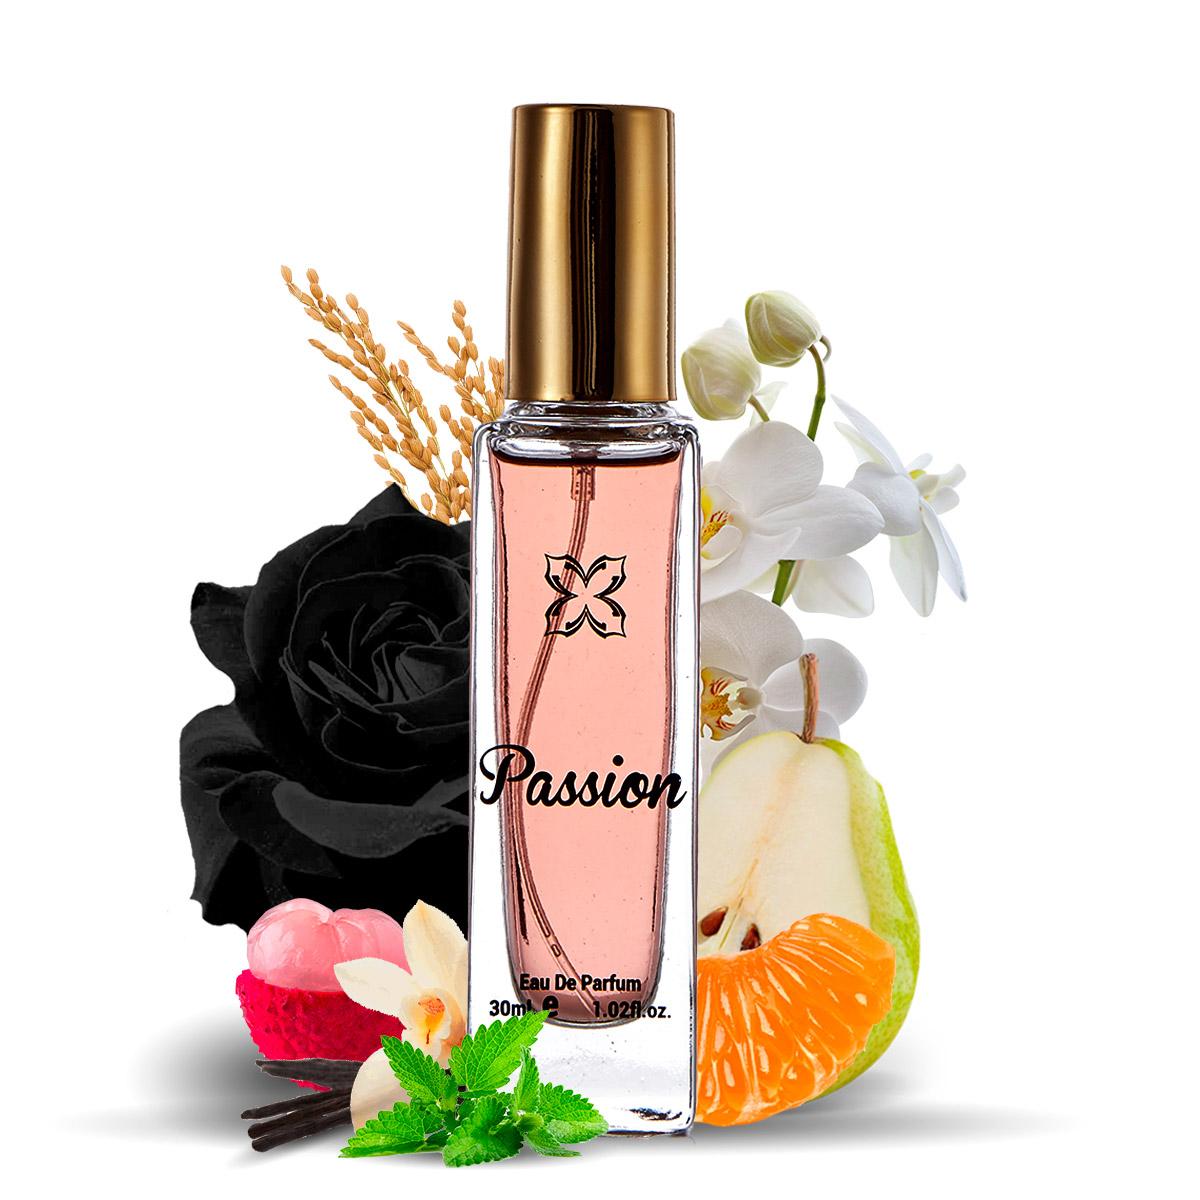 Essenciart Passion Perfume Feminino Importado Edt 30ml